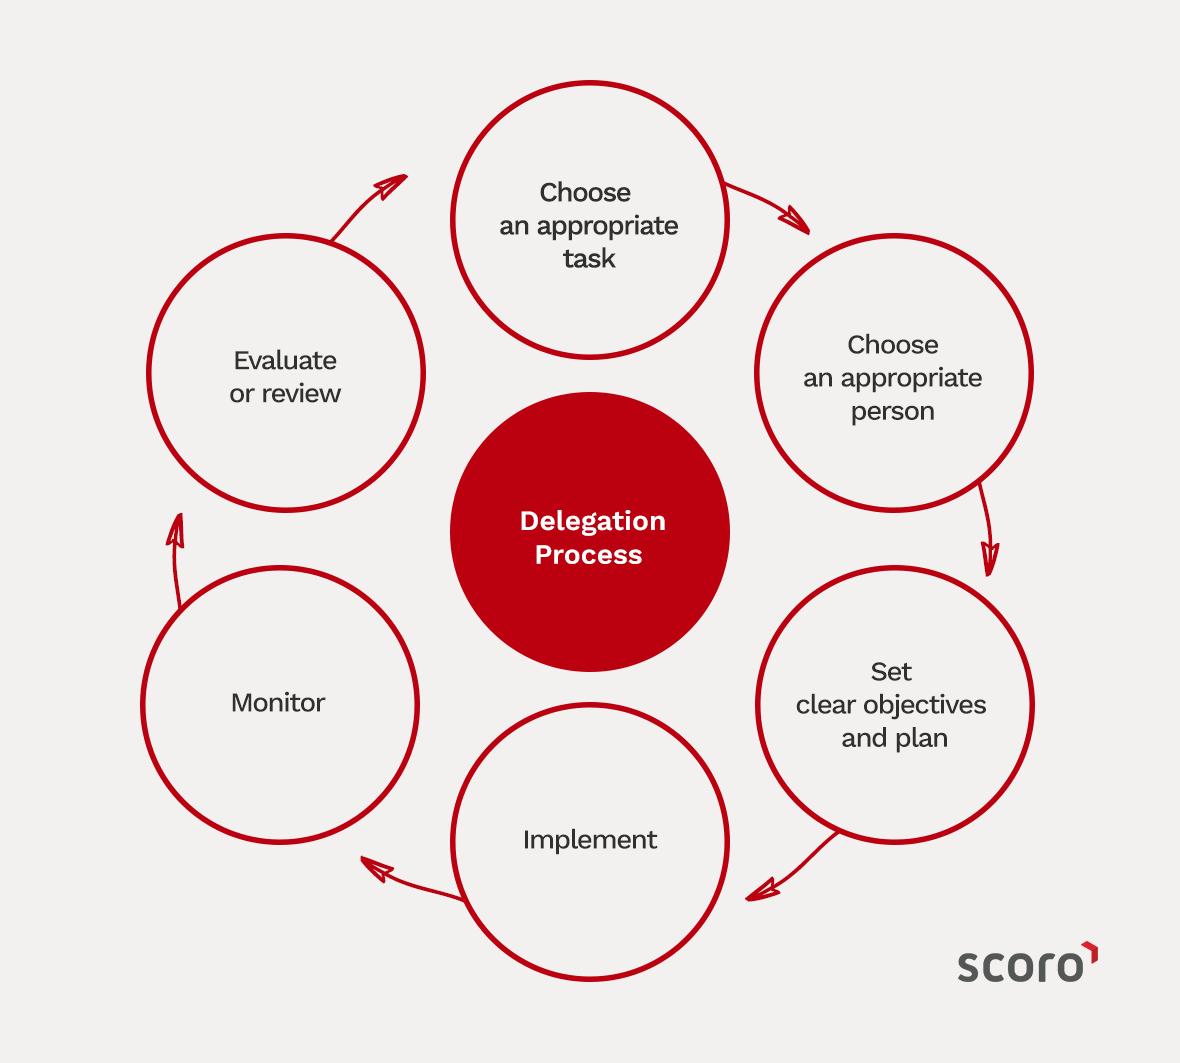 Project Management Delegation Process